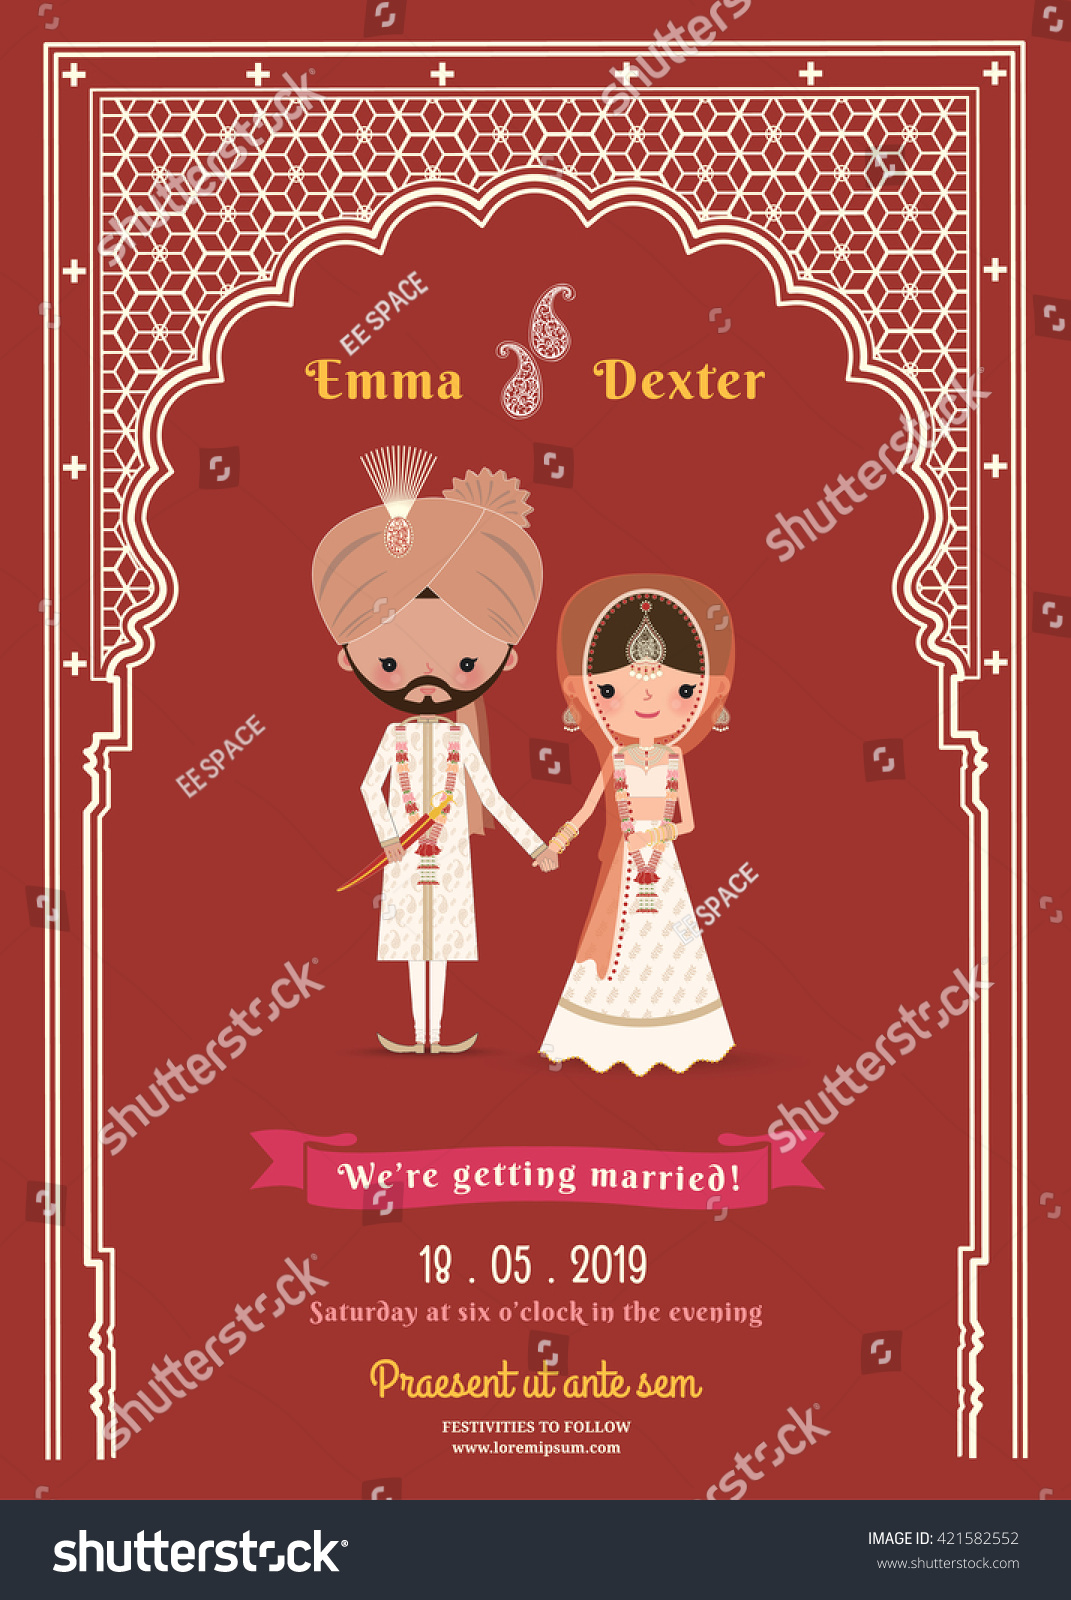 Indian Wedding Bride Groom Cartoon Save Stock Vector (Royalty Free ...